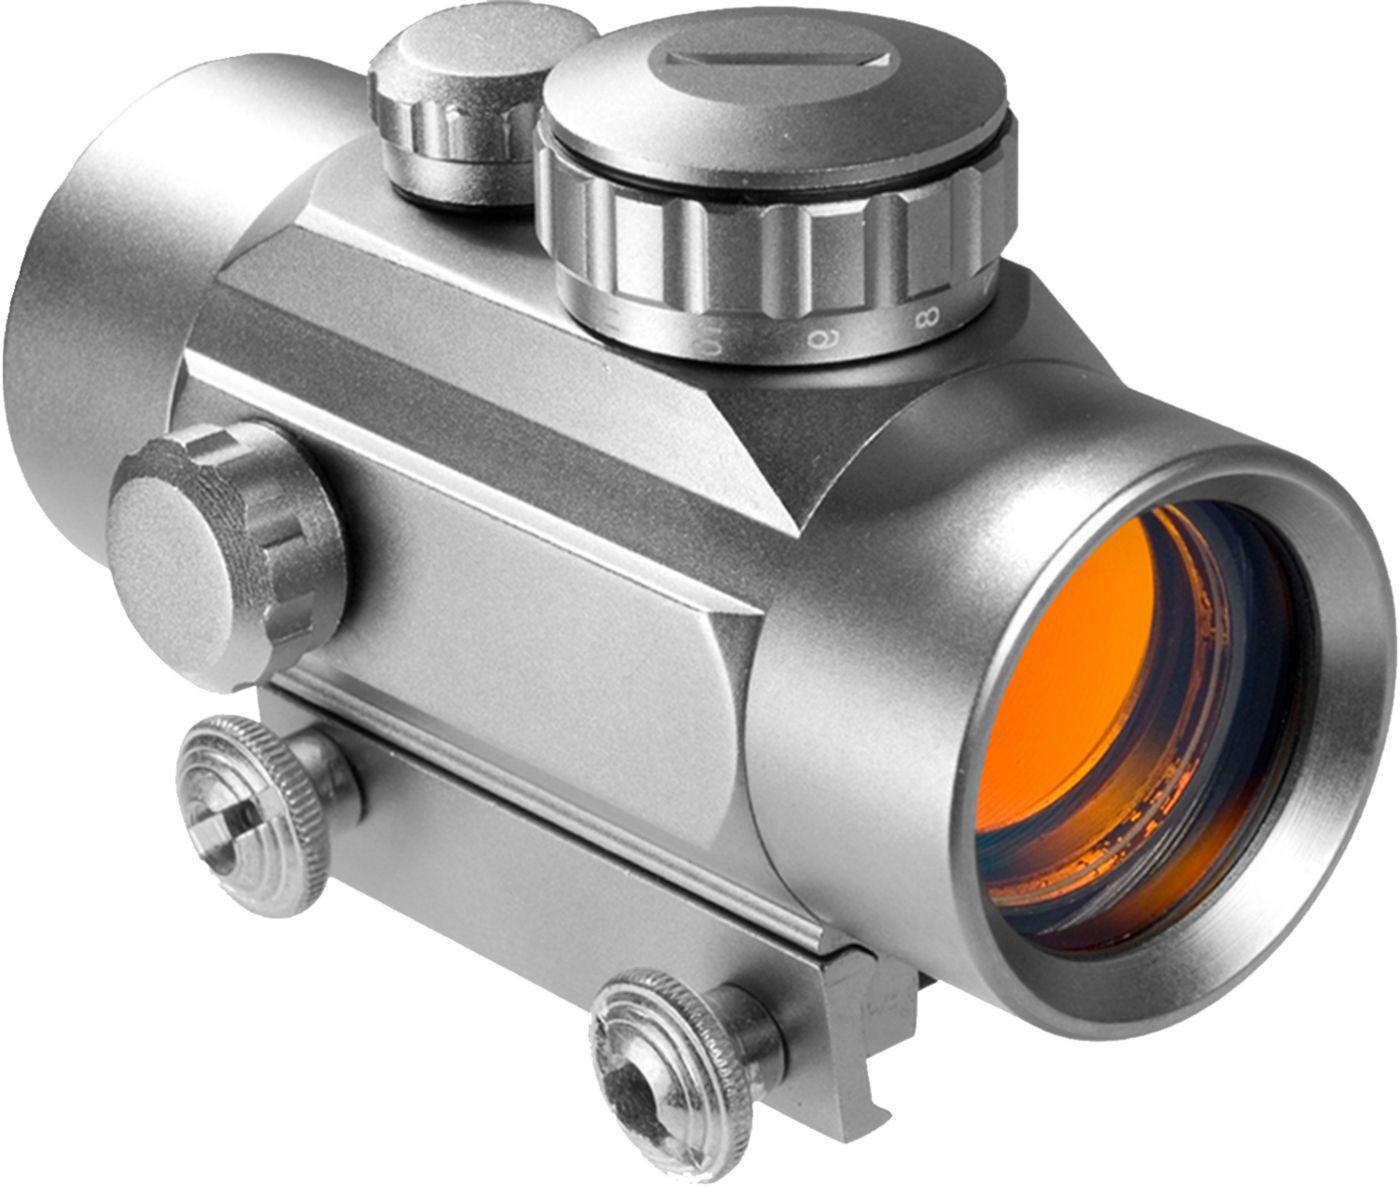 Barska 30mm Red Dot Scope - Silver